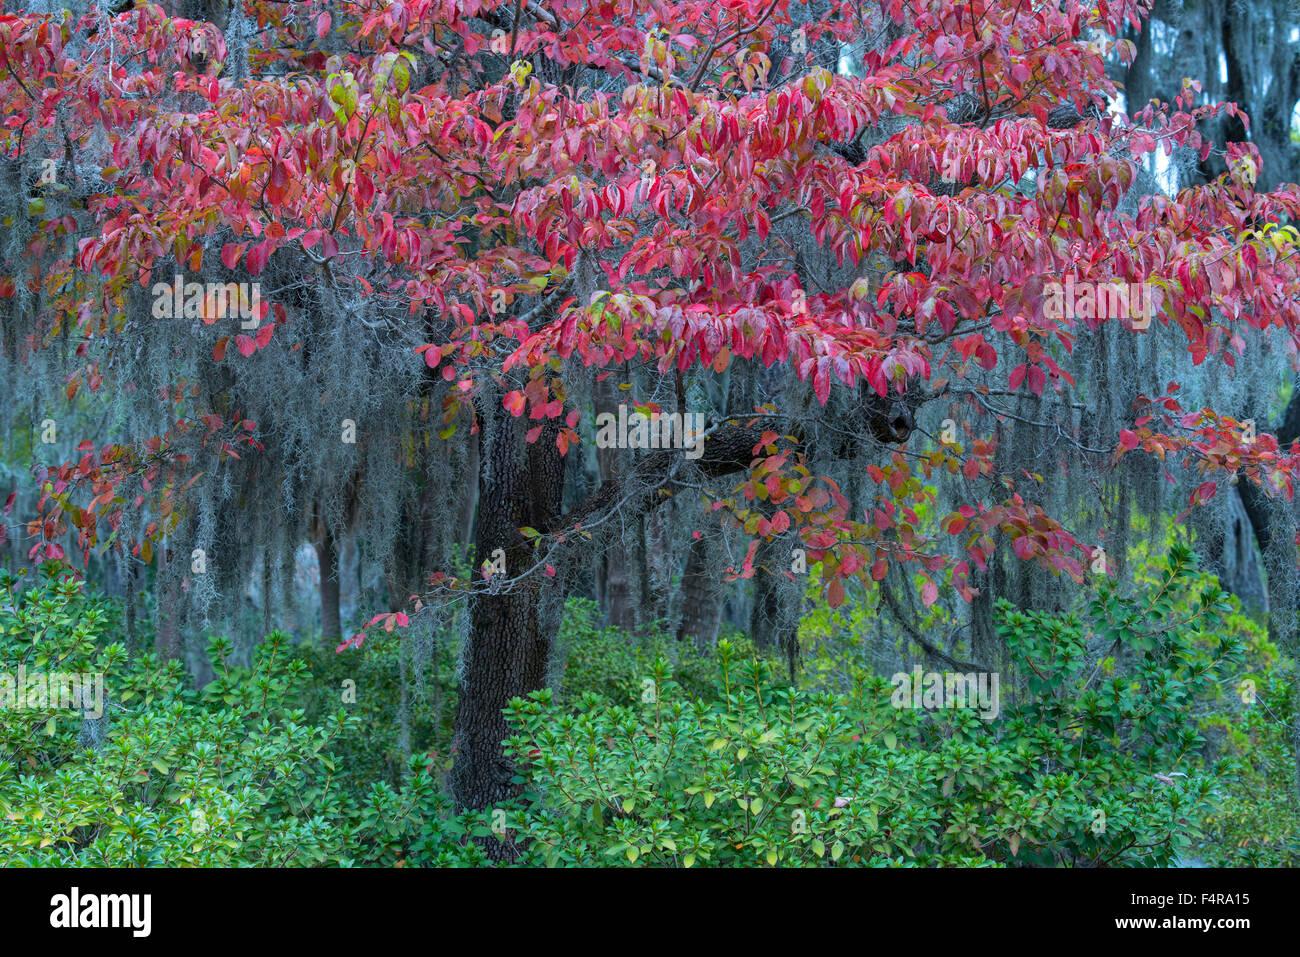 USA, United States, America, Georgia, southern, Savannah, Bonaventure, cemetery, tree, foliage, nature, autumn - Stock Image